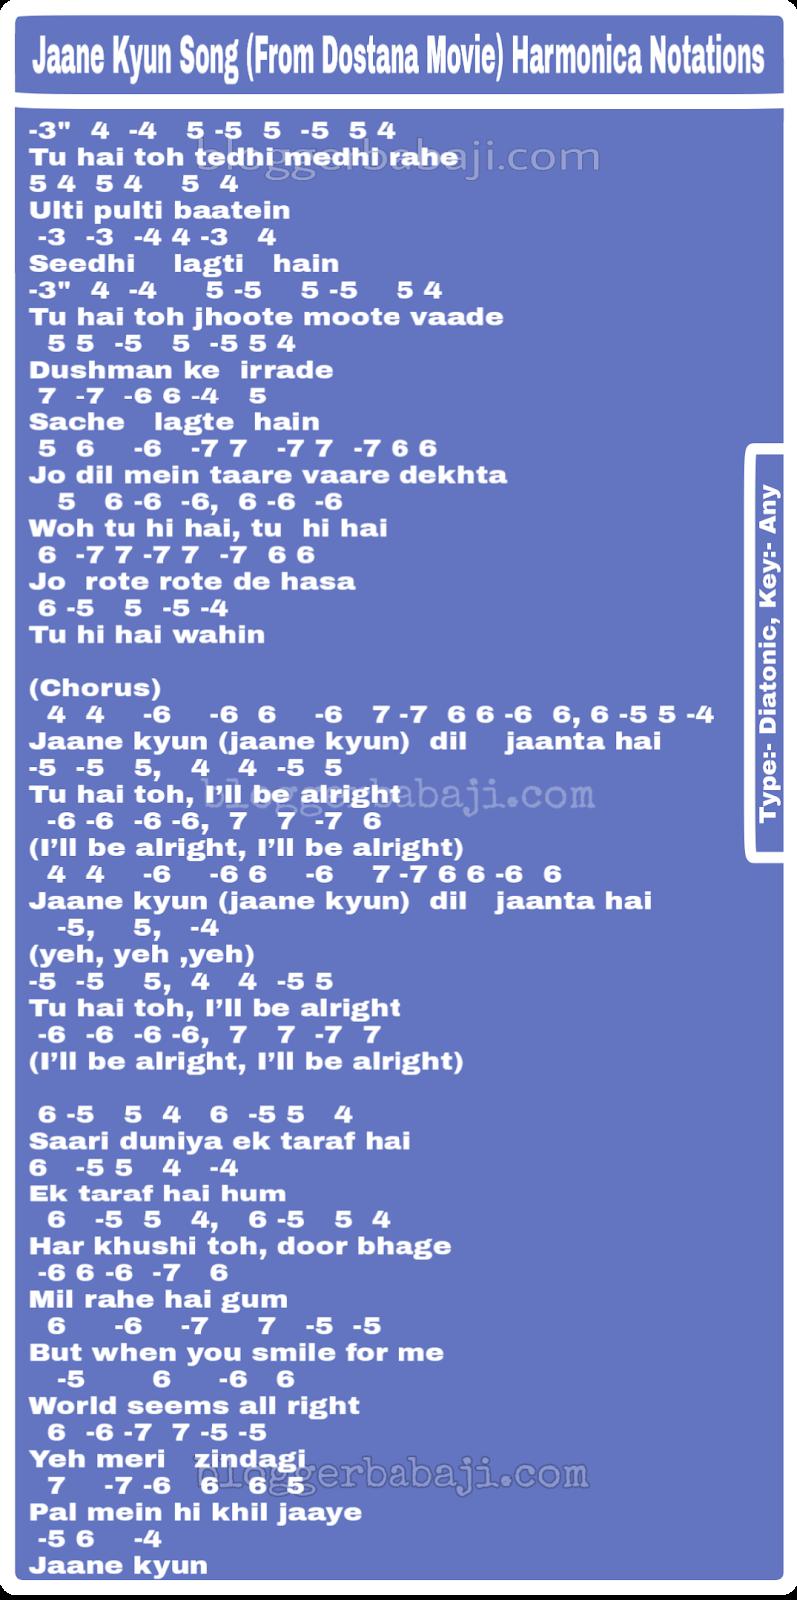 Bollywood Song Harmonica Notations Hindi Jaane Kyun Song Vaaste song dhvani bhanushali, piano tutorial step by step with notes, how to play vaaste song on piano सीखो सरल के. bollywood song harmonica notations